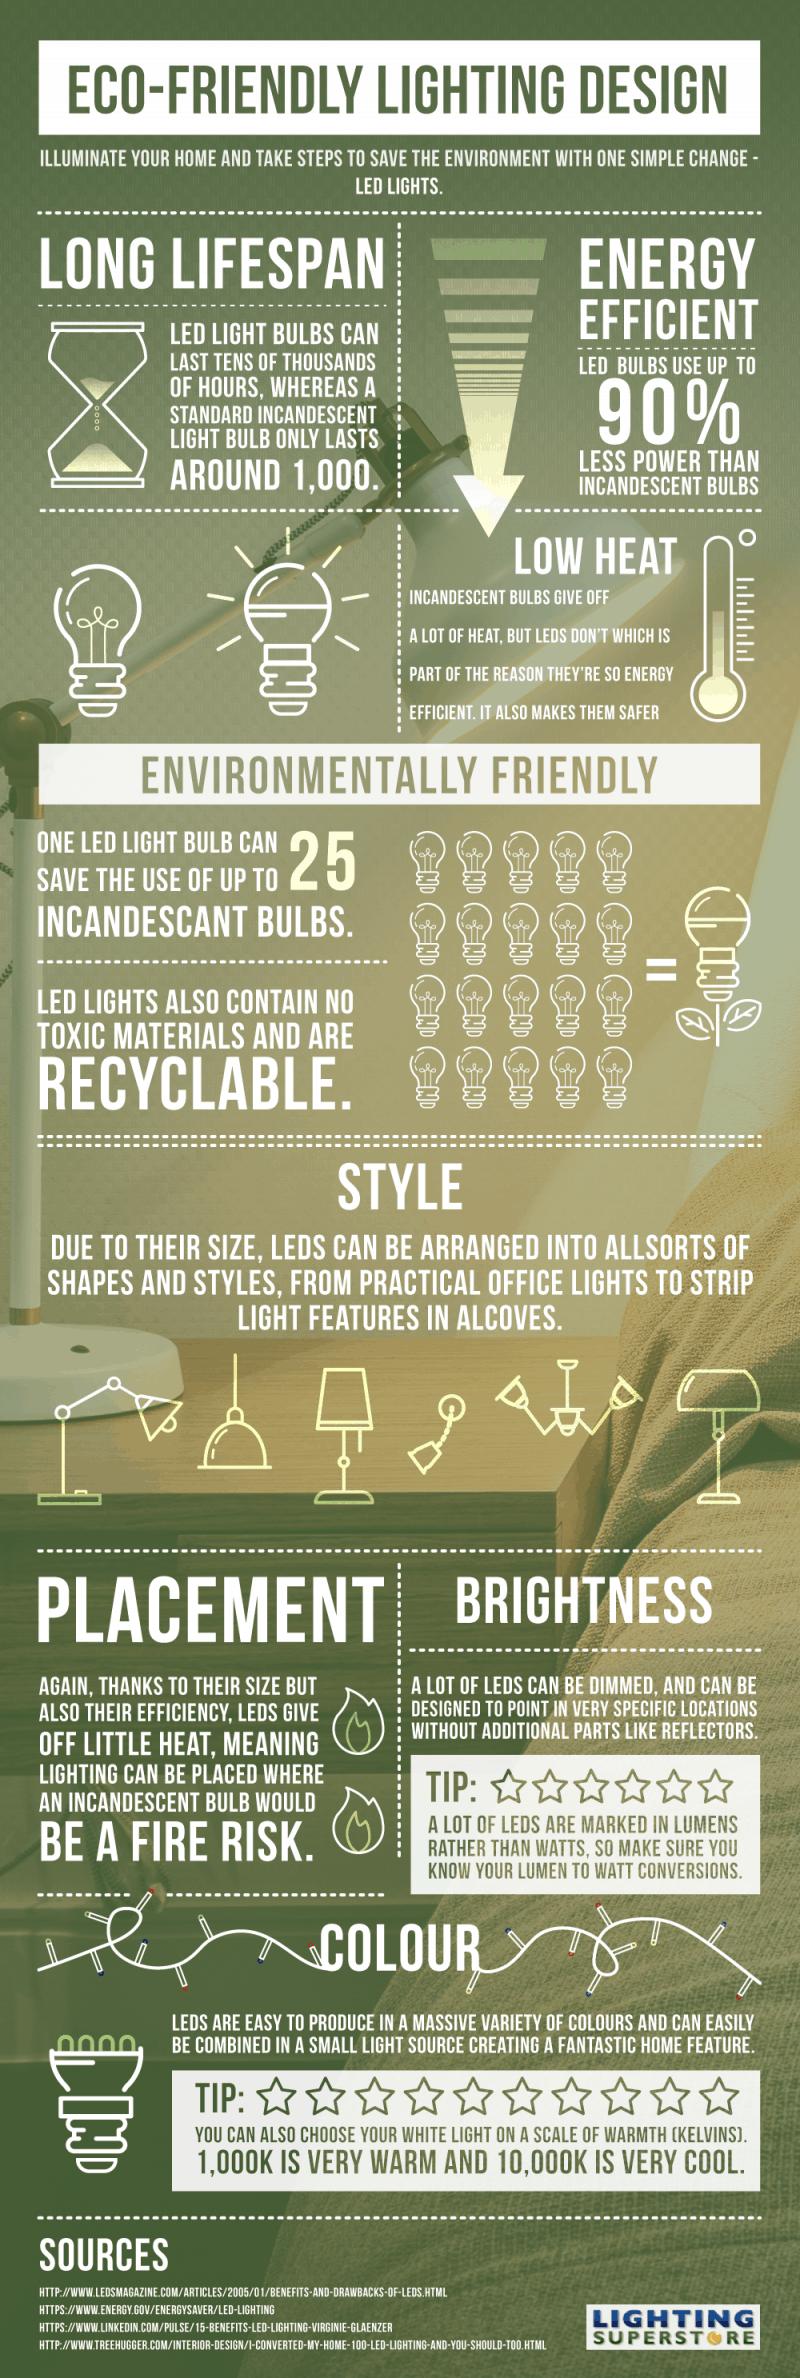 Eco-Friendly Lighting Design